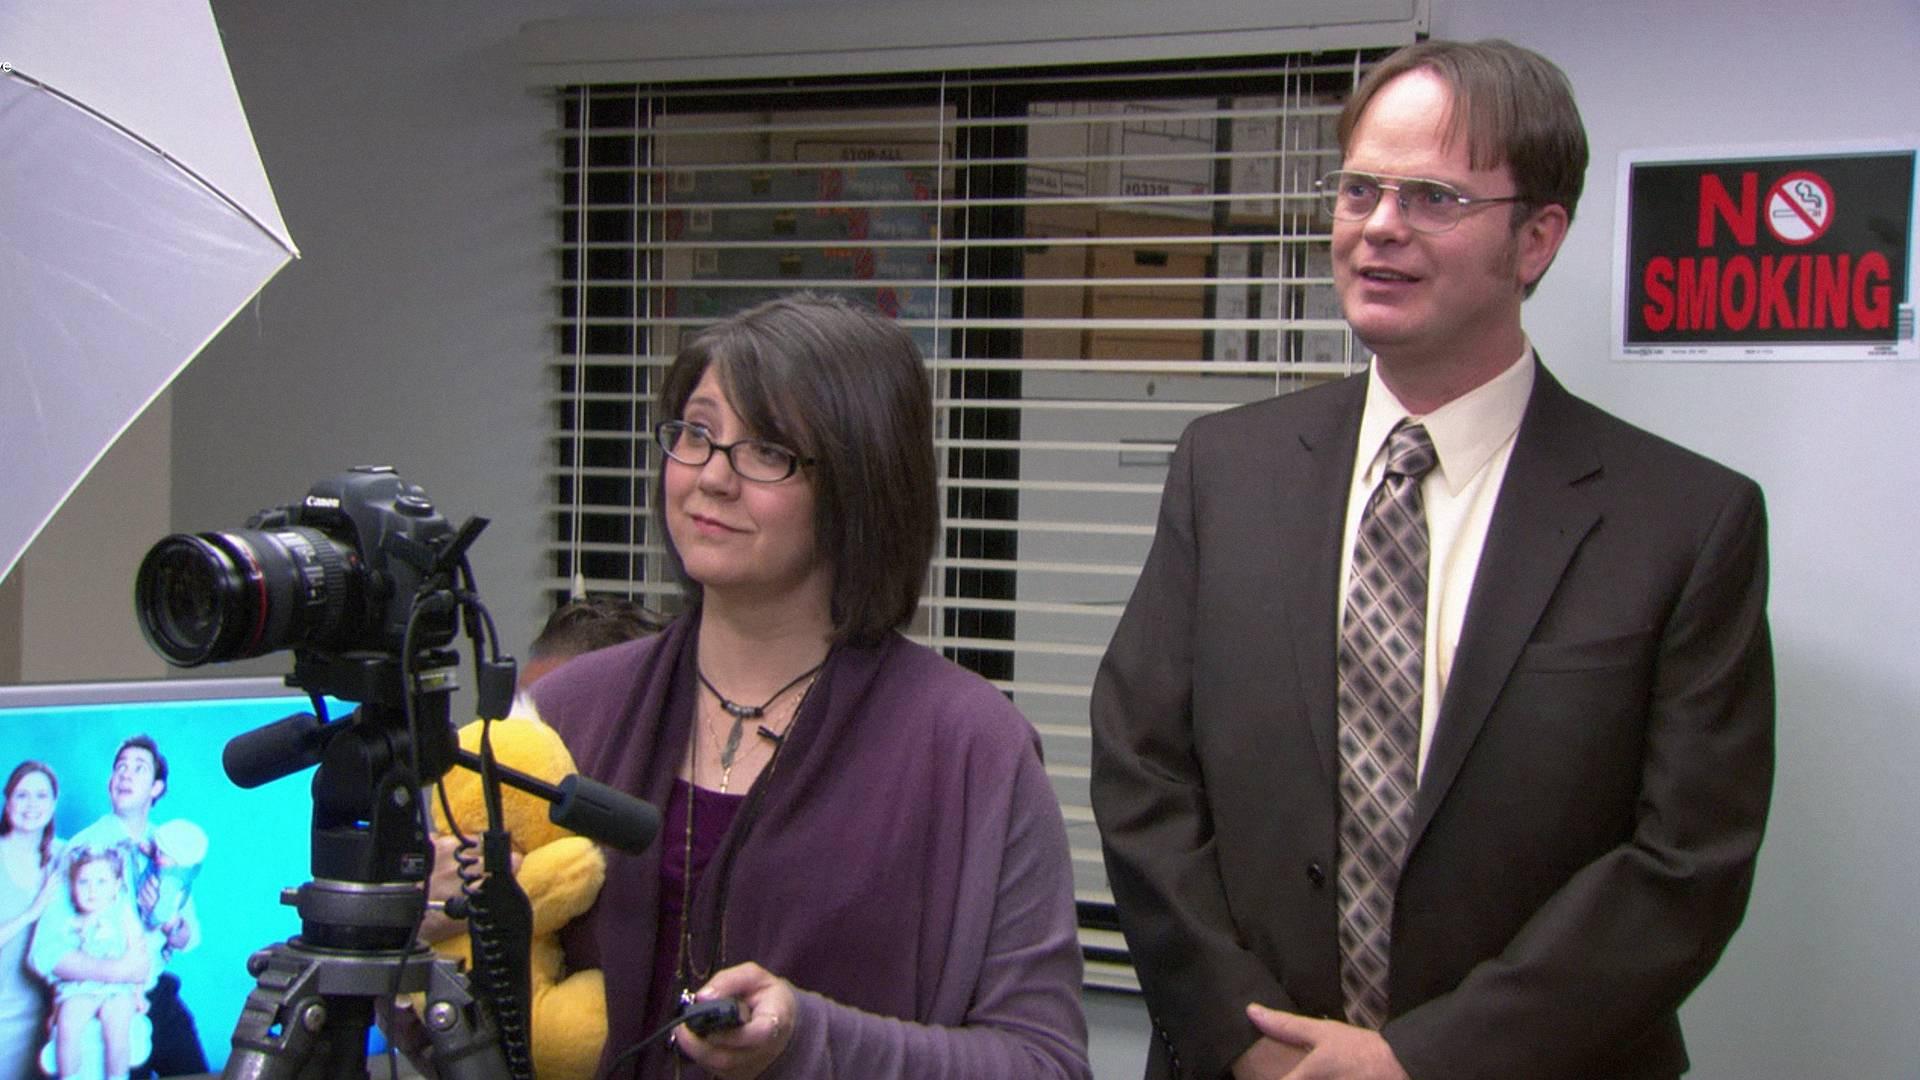 The Office Season 8 Episode 24